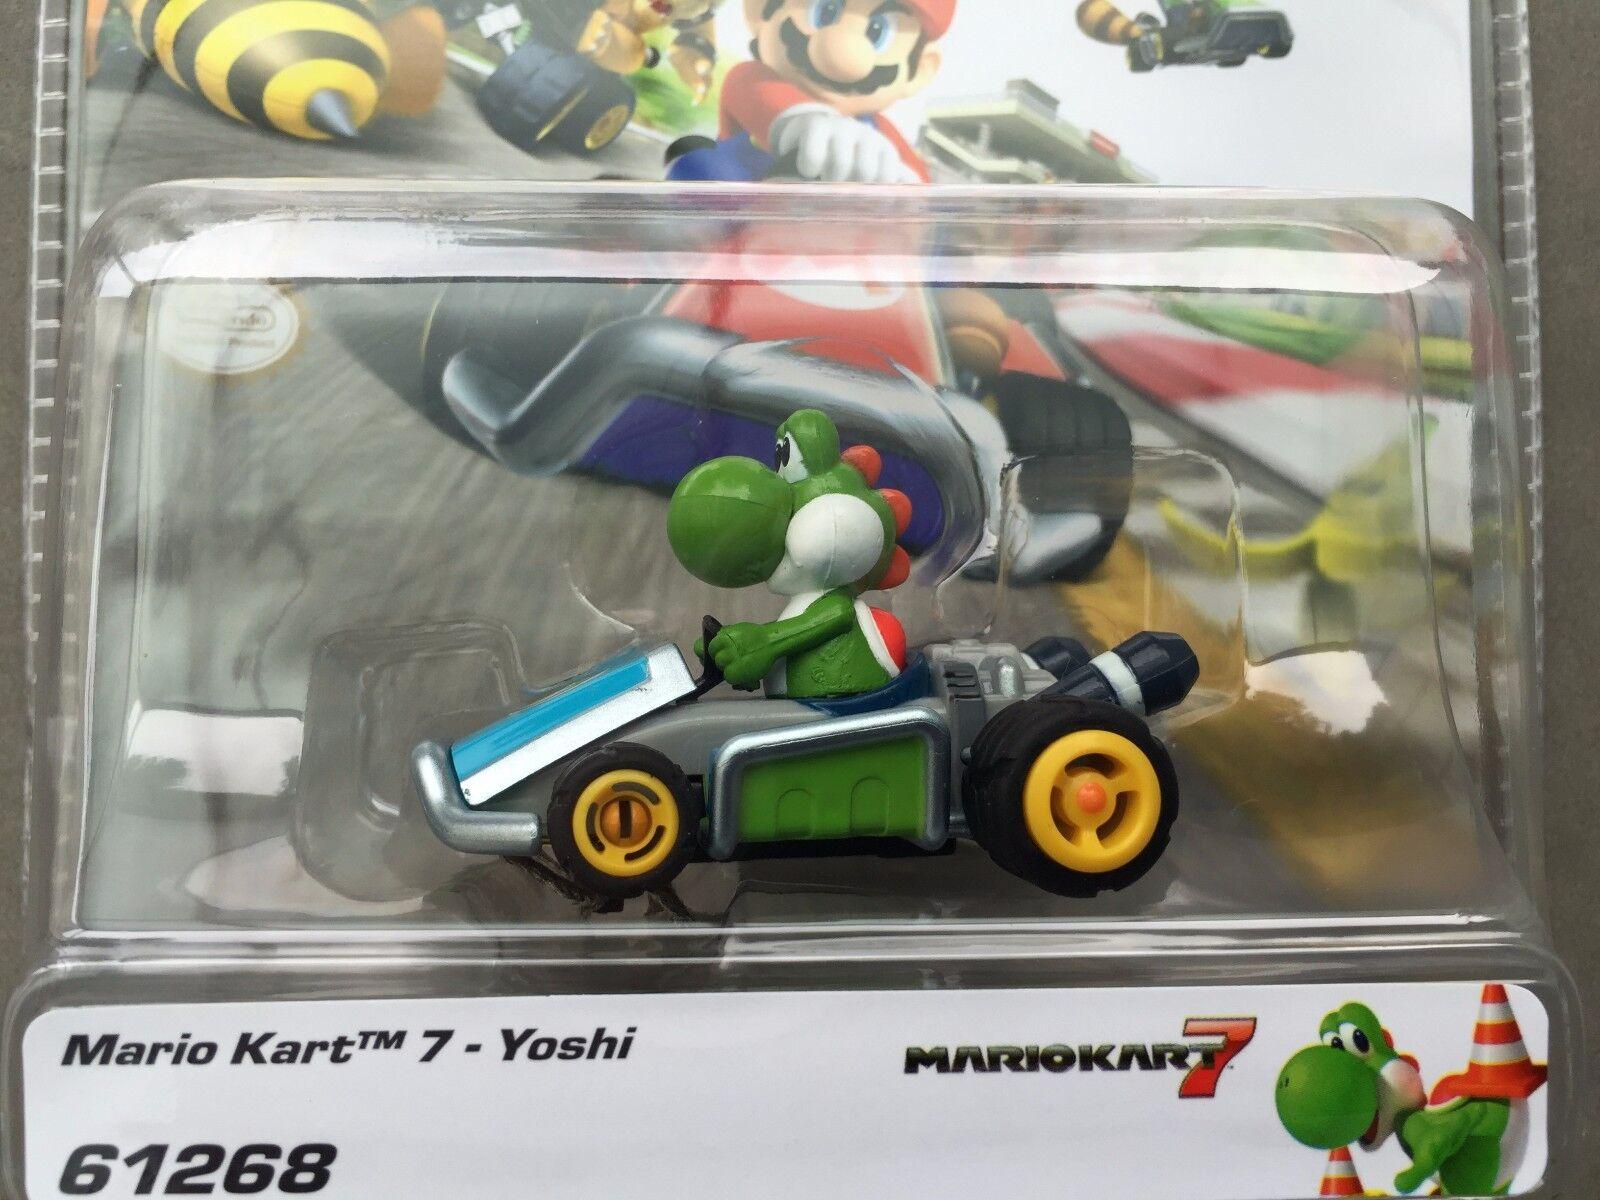 Carrera GO 61268  Mario Kart Kart Kart 7  YOSHI  NEU OVP  | Modisch  647a20